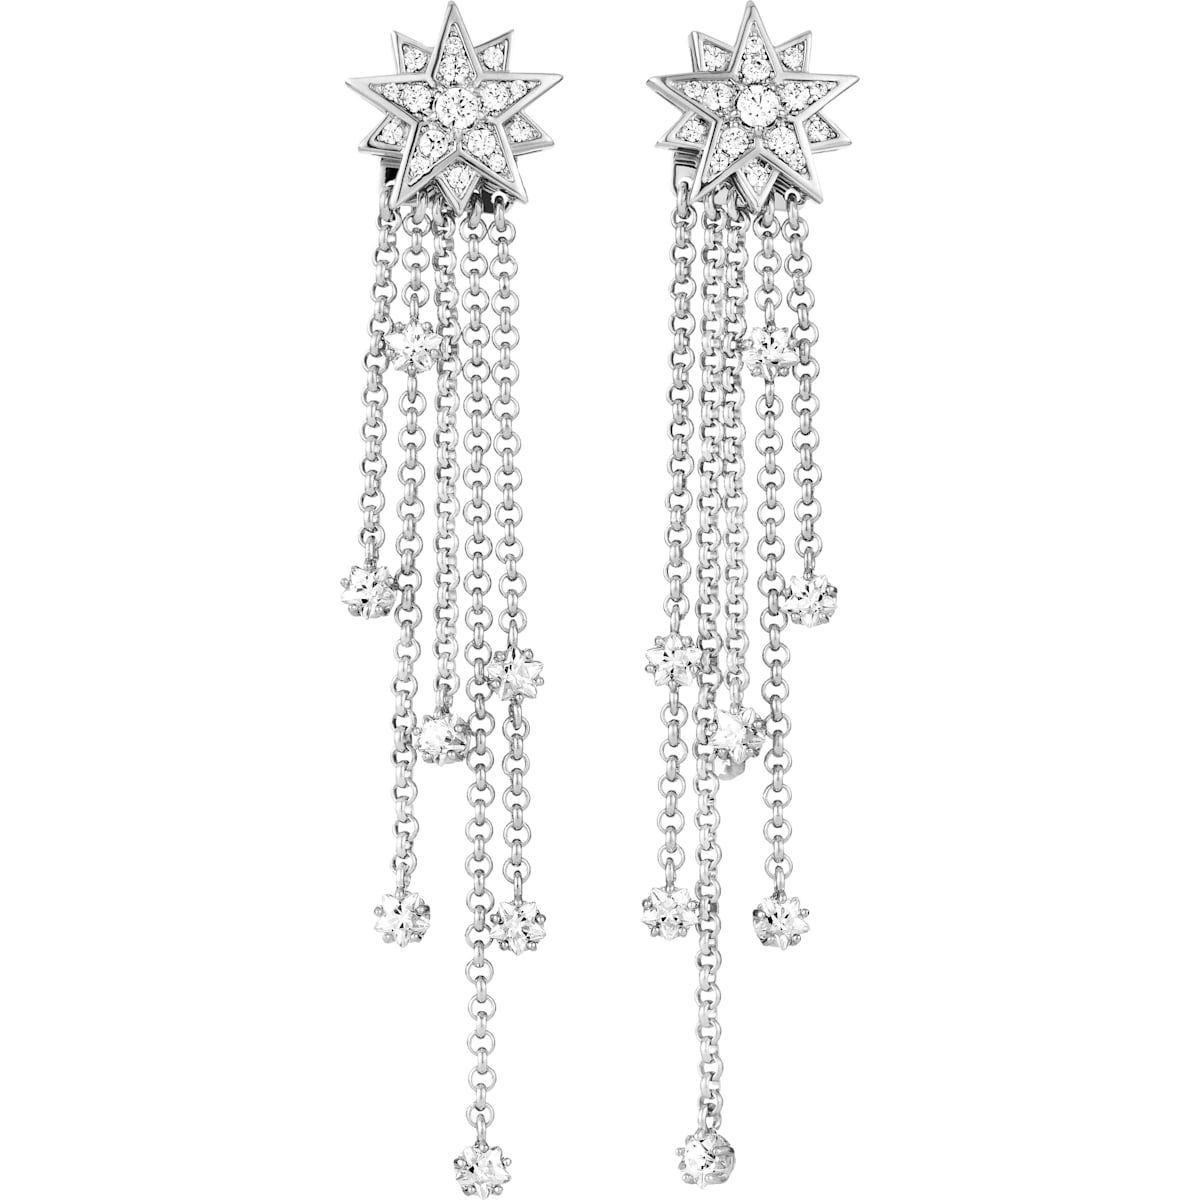 Penélope Cruz Moonsun Strand Pierced Earrings, Limited